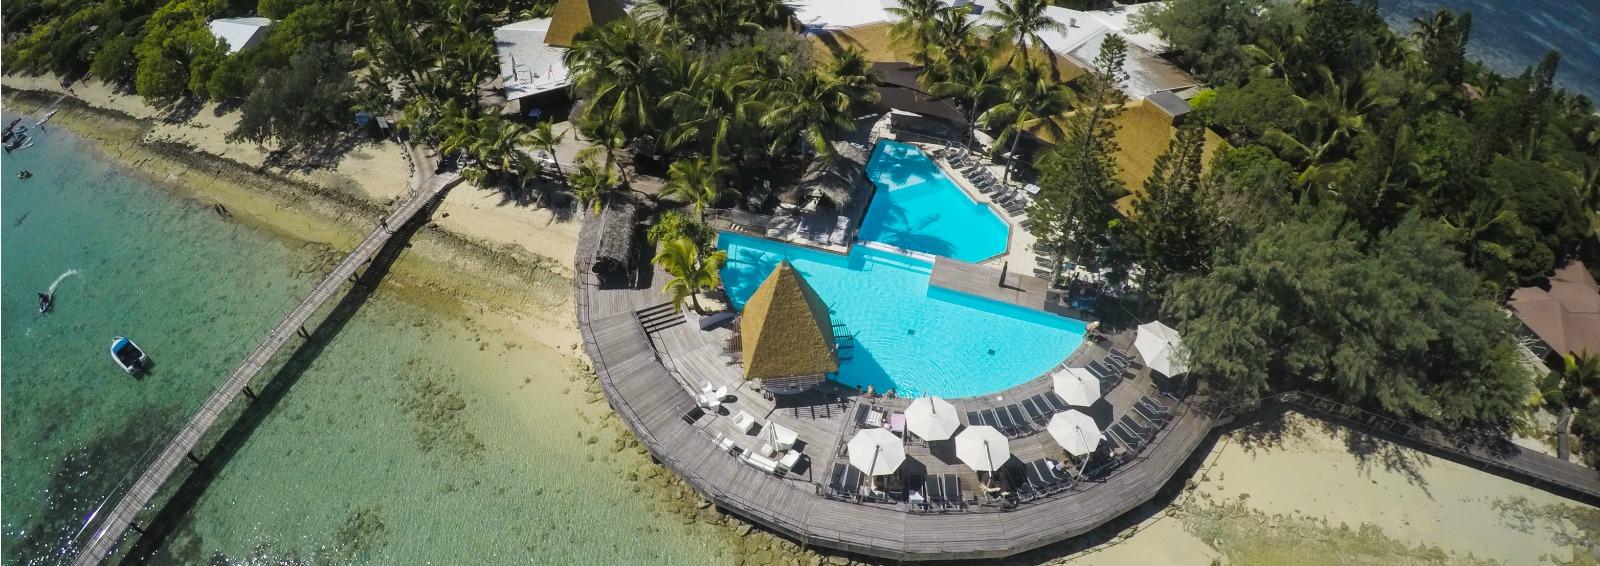 Swimming - L'Escapade Island Resort